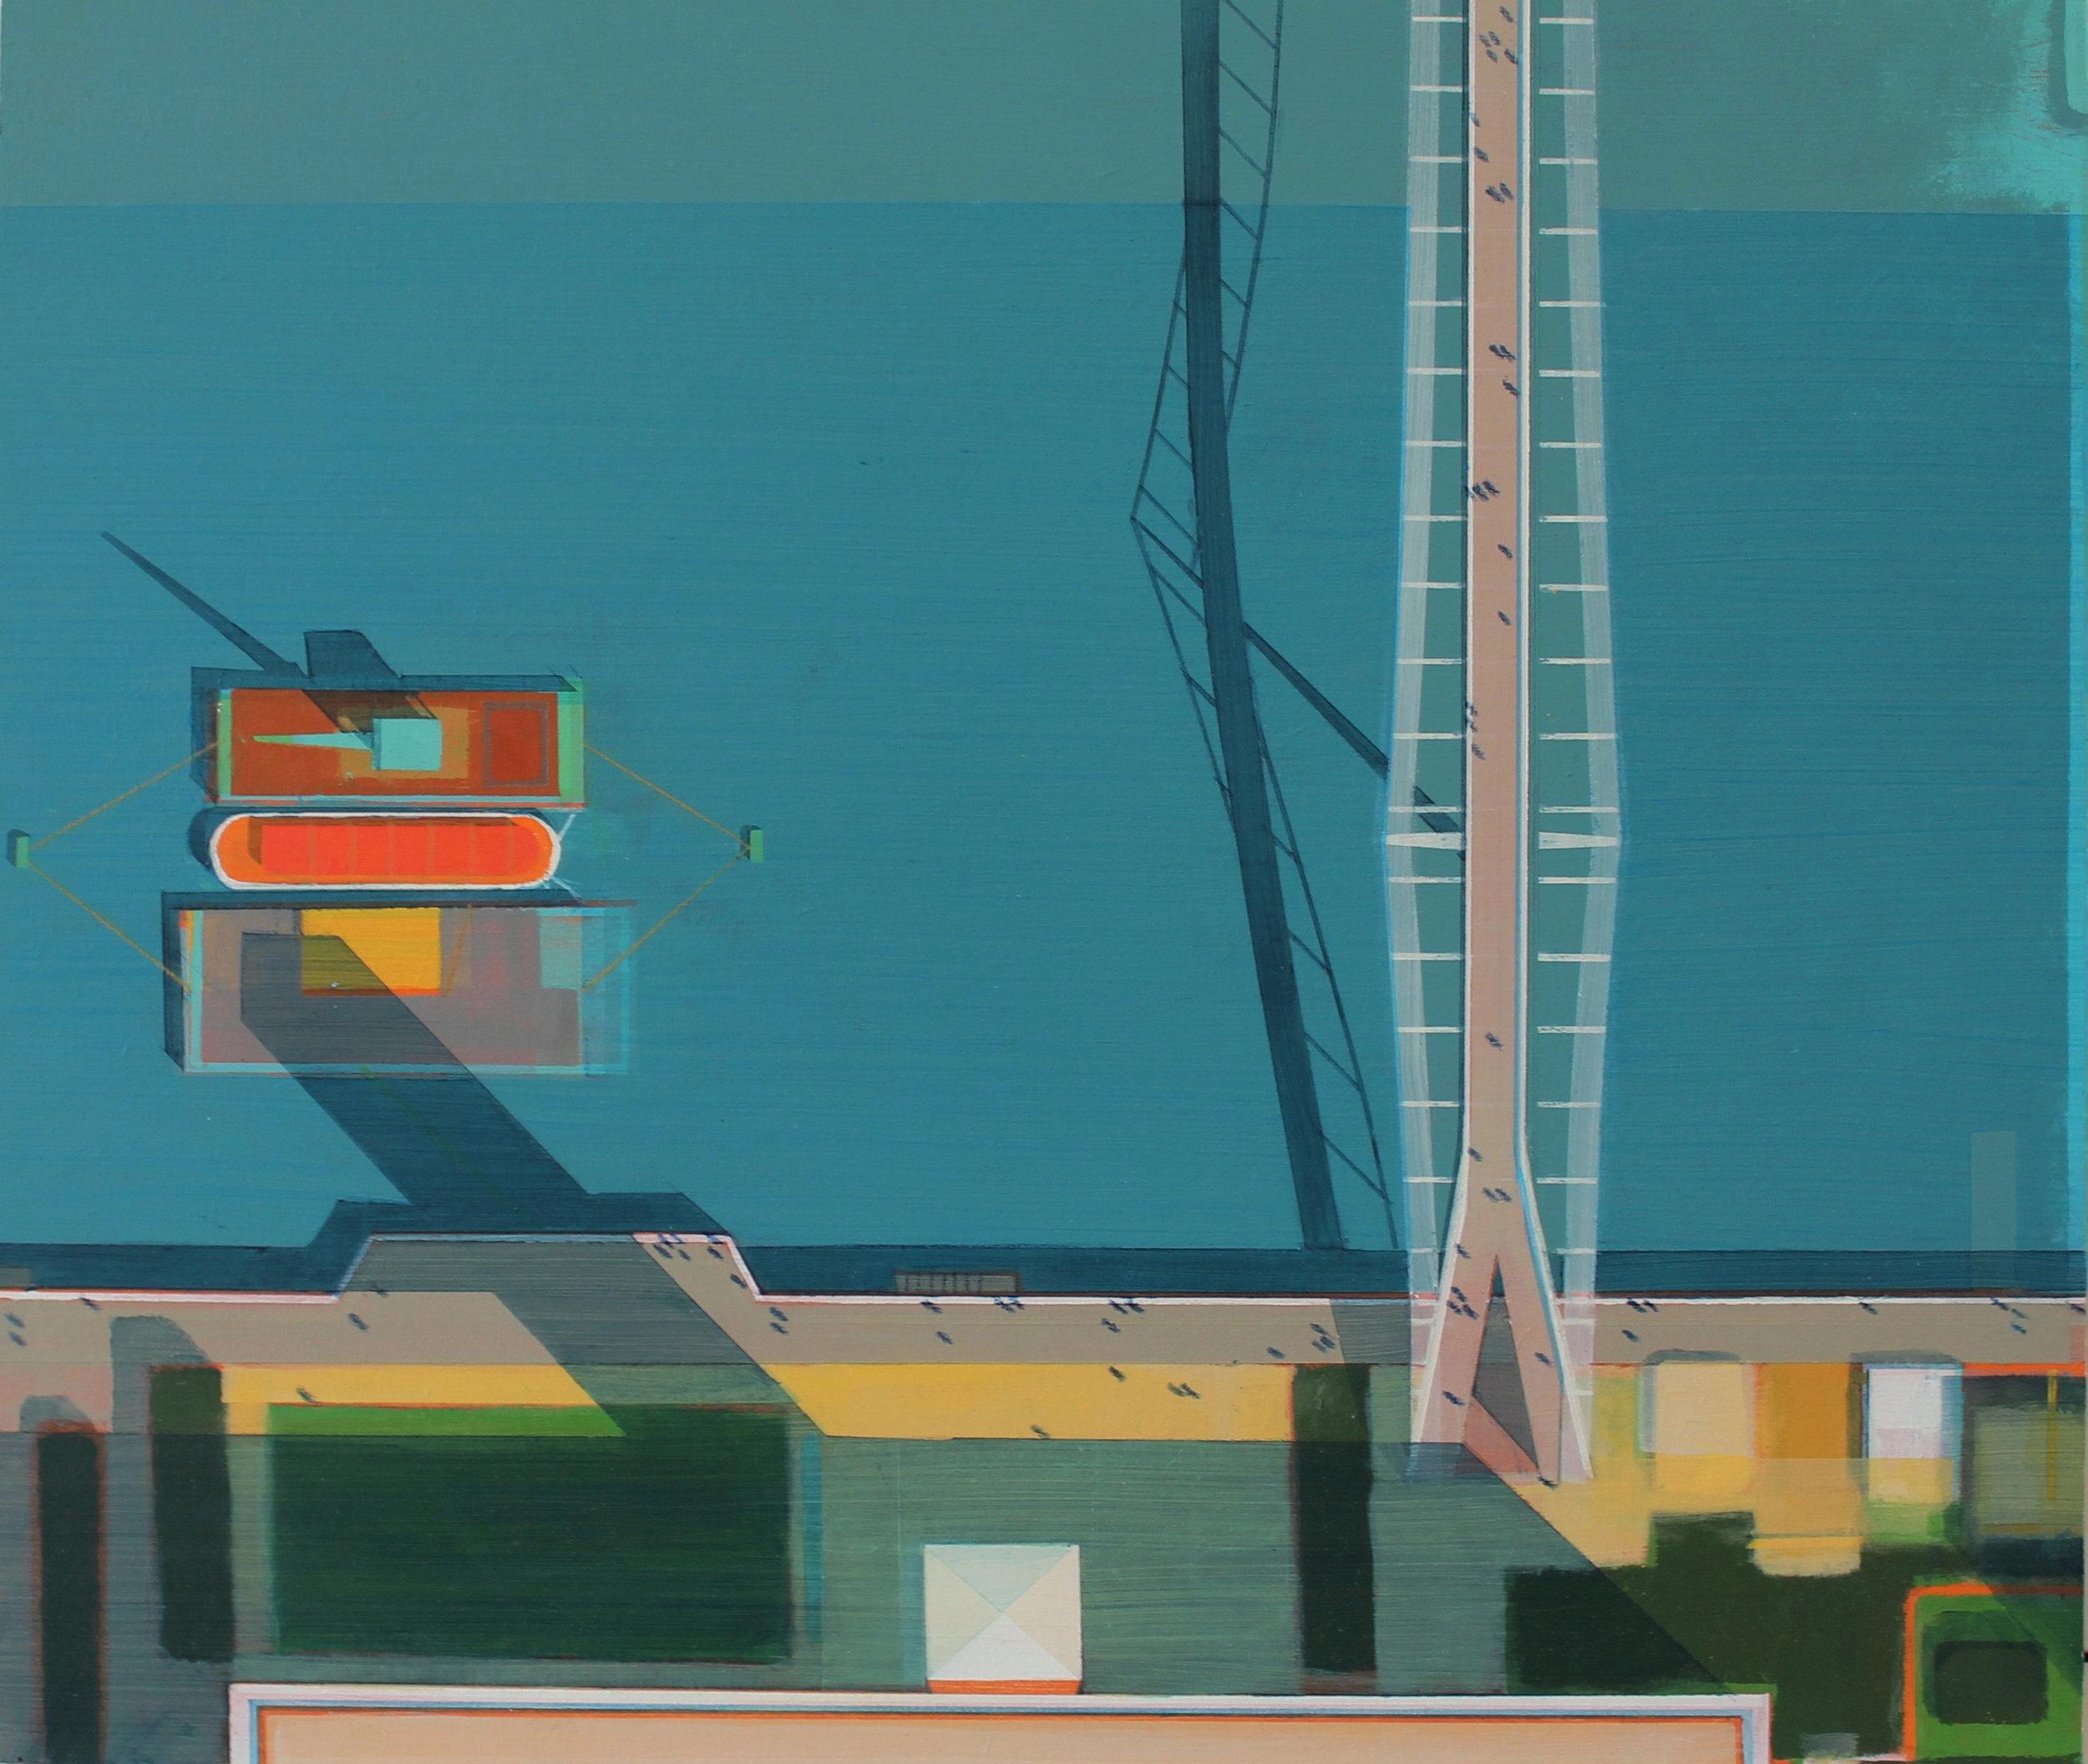 Millennium Bridge and Tate Modern, acrylic on board, 30x36 cm, £sold.